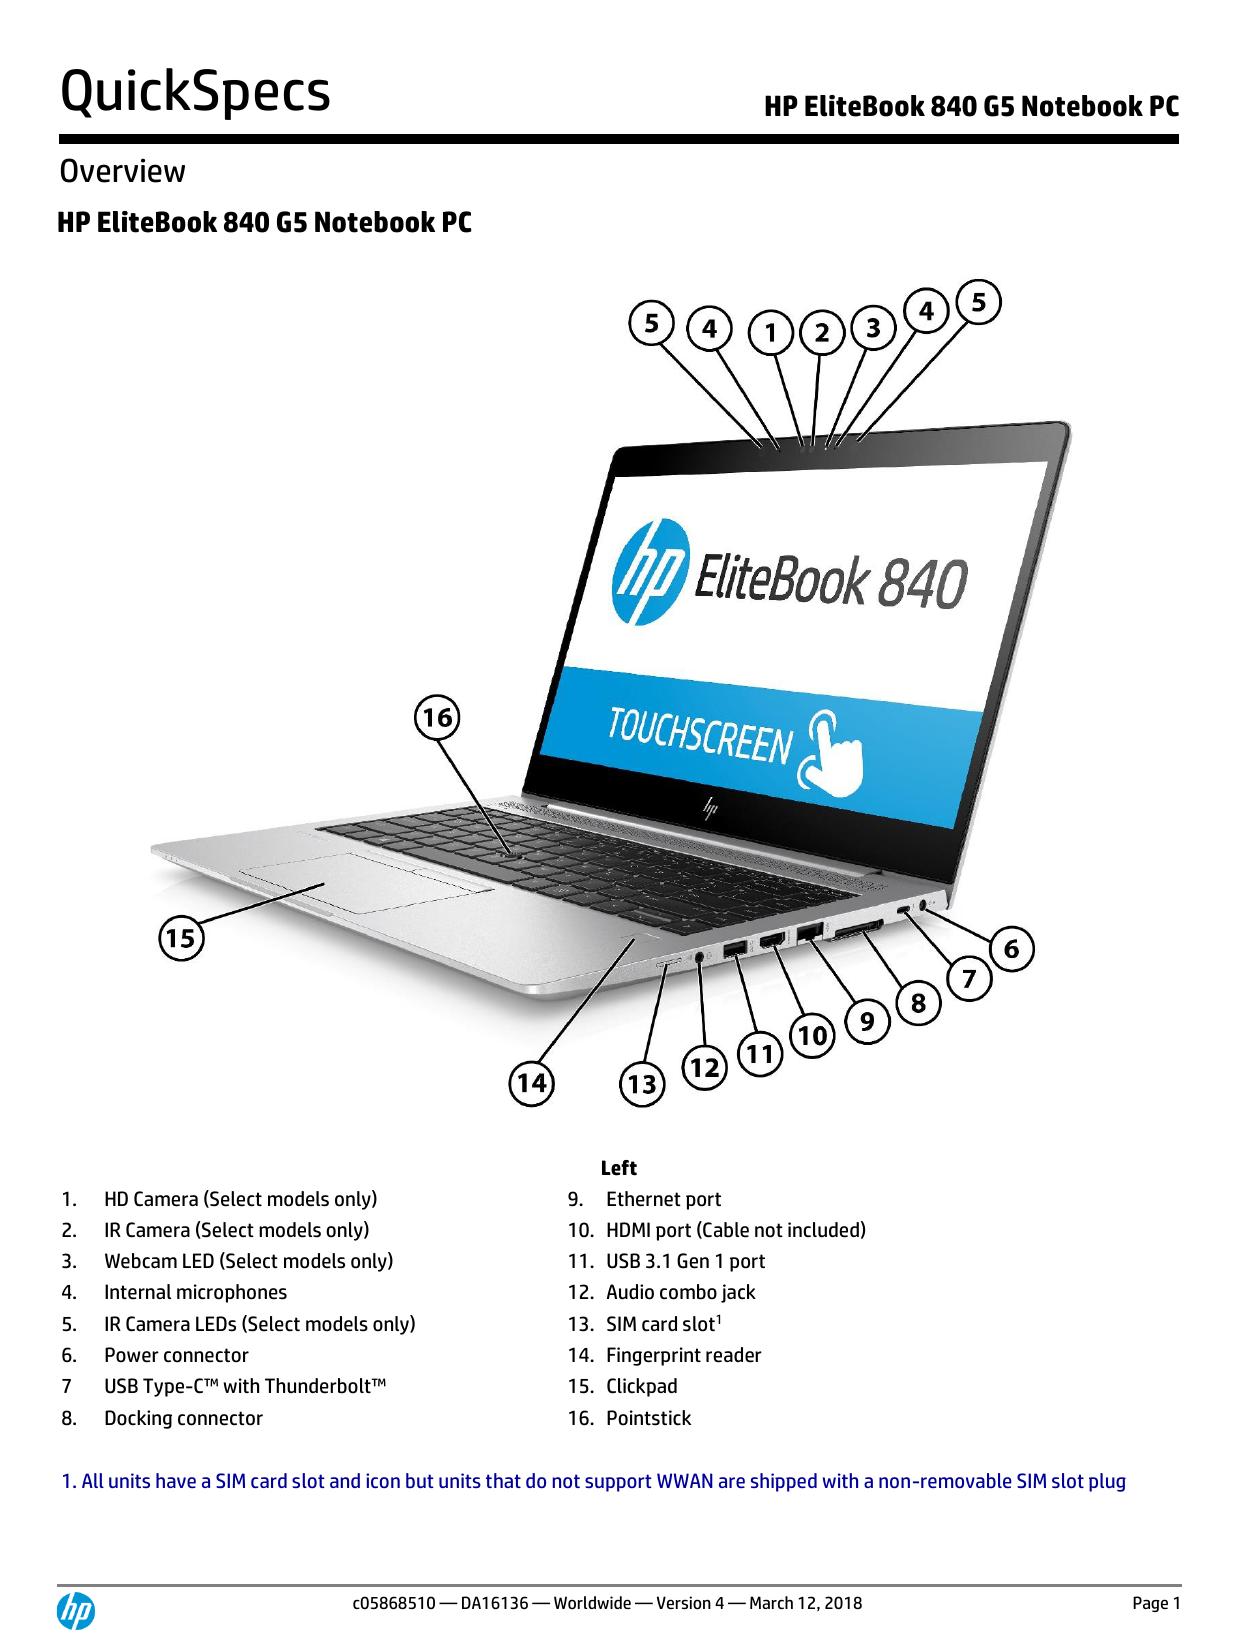 HP EliteBook 840 G5 Notebook PC   manualzz com